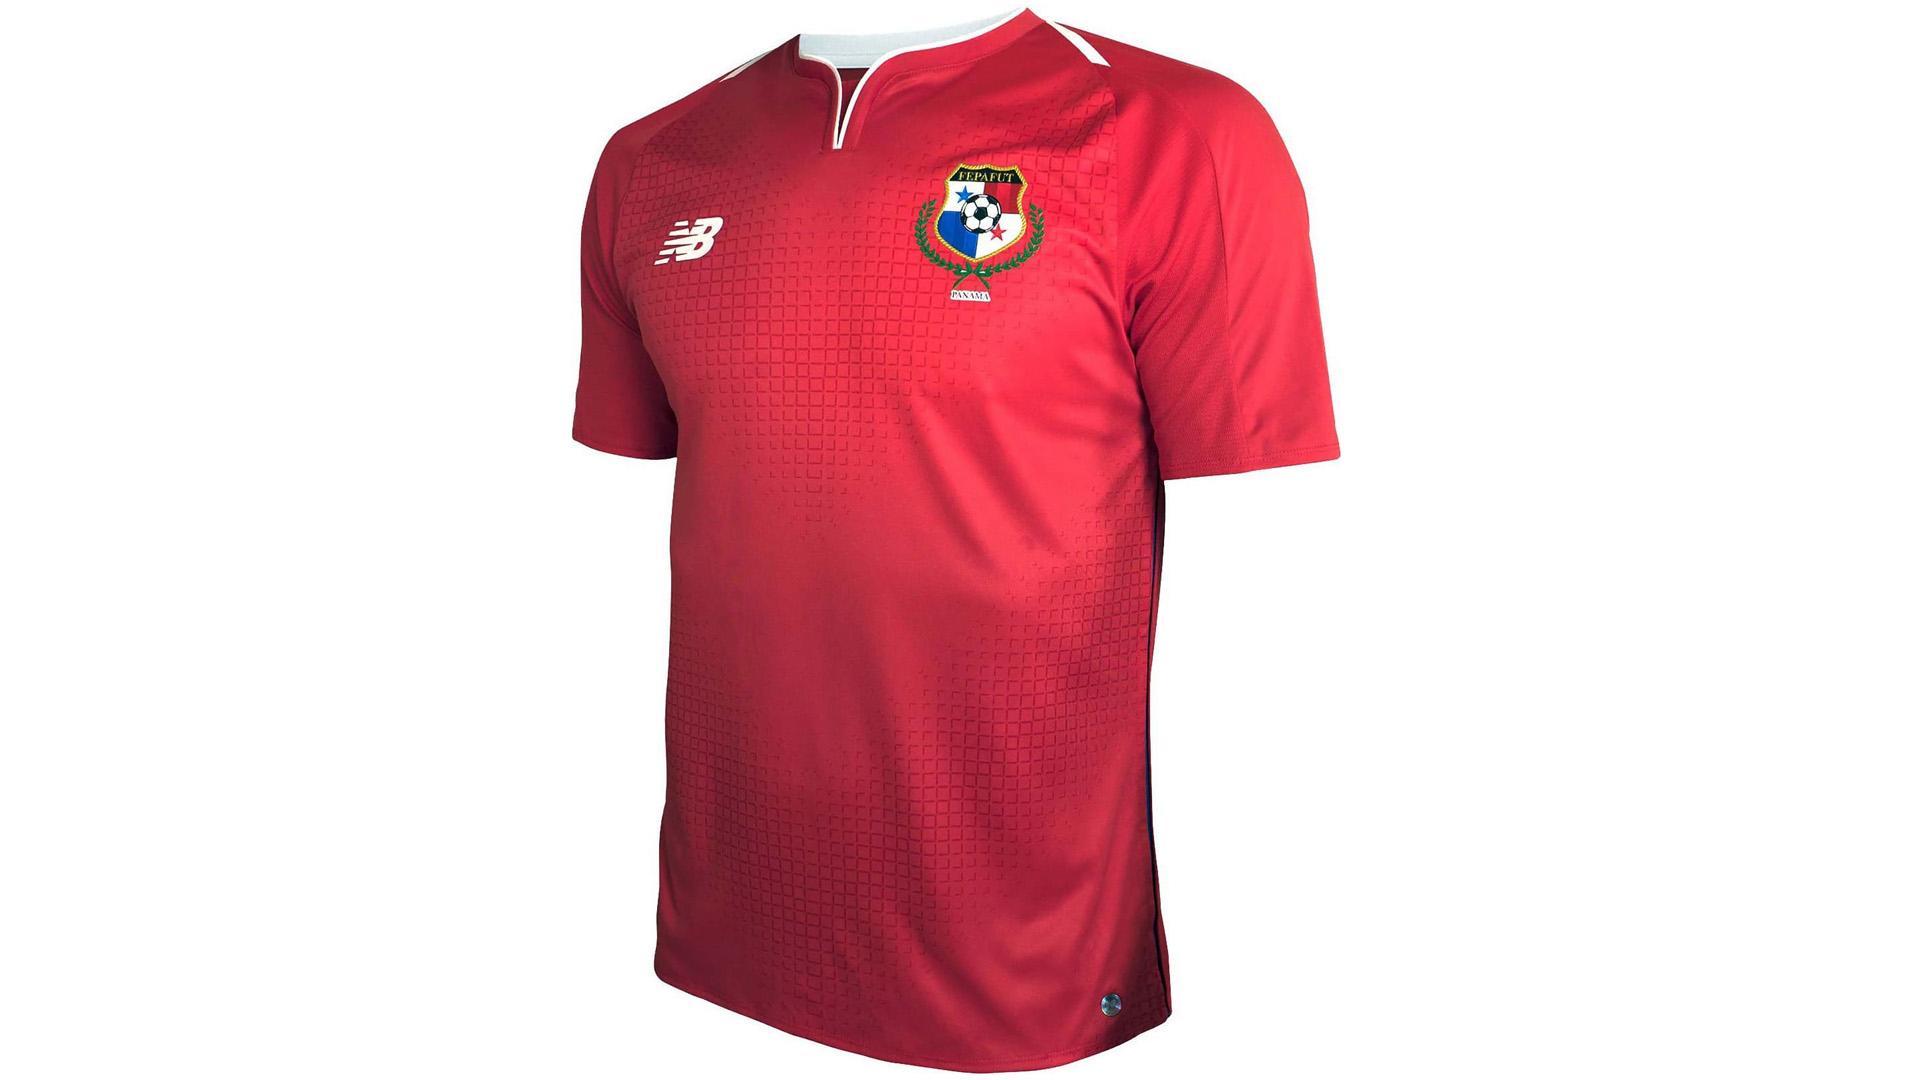 Panama Camiseta Titular Home Kit 2018